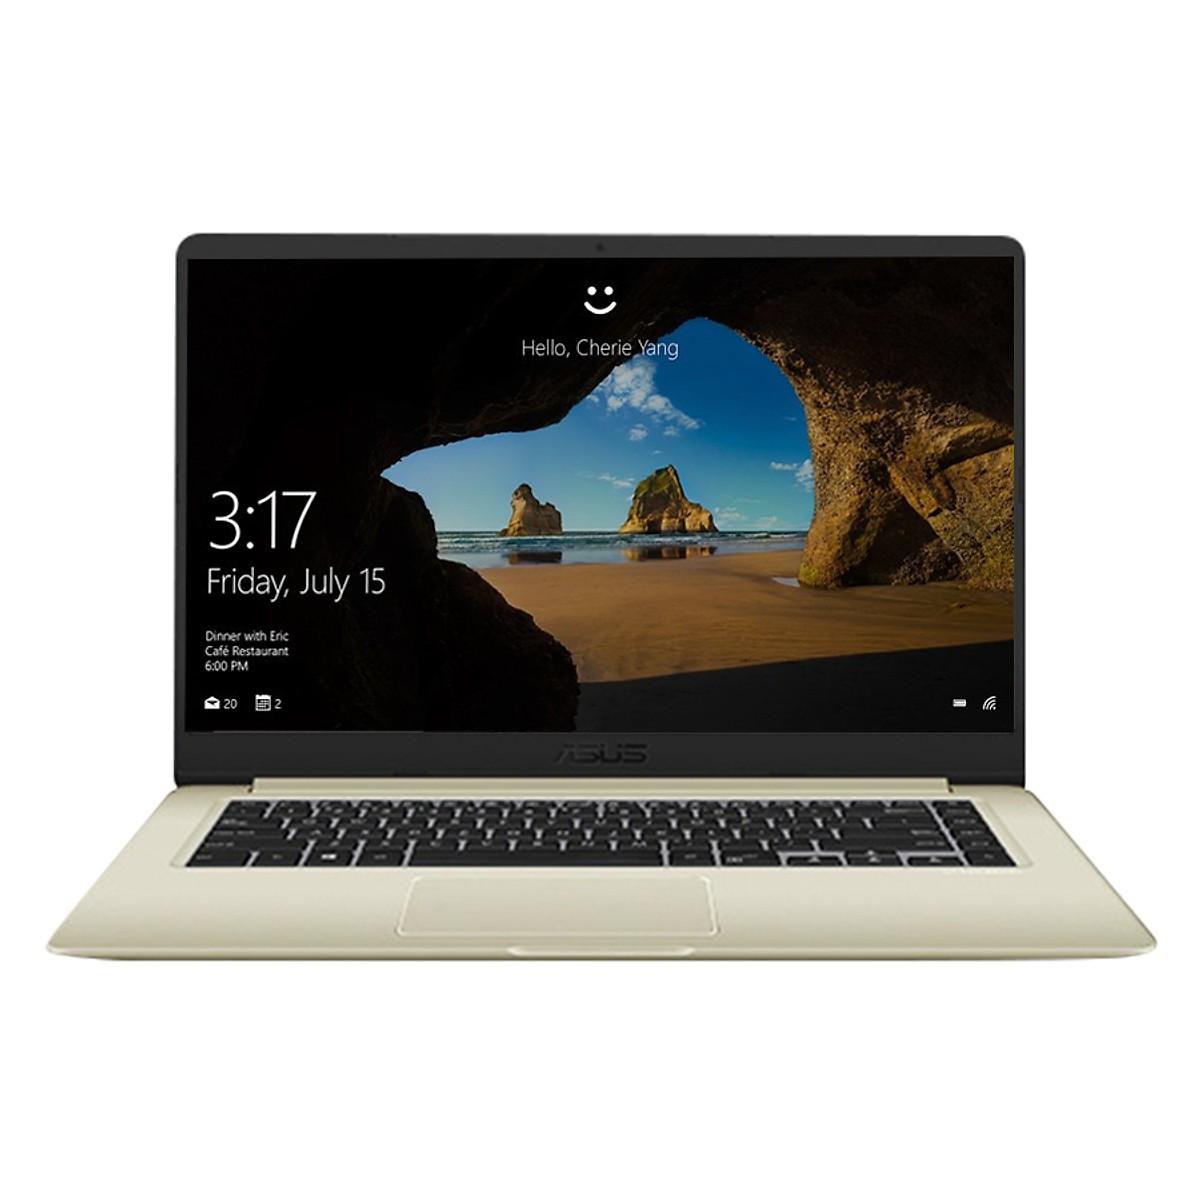 Asus   Máy tính xách tay - Laptop   Laptop Asus Vivobook A510UF-BR183T Core i7-8550U/Win 10 (15.6 in